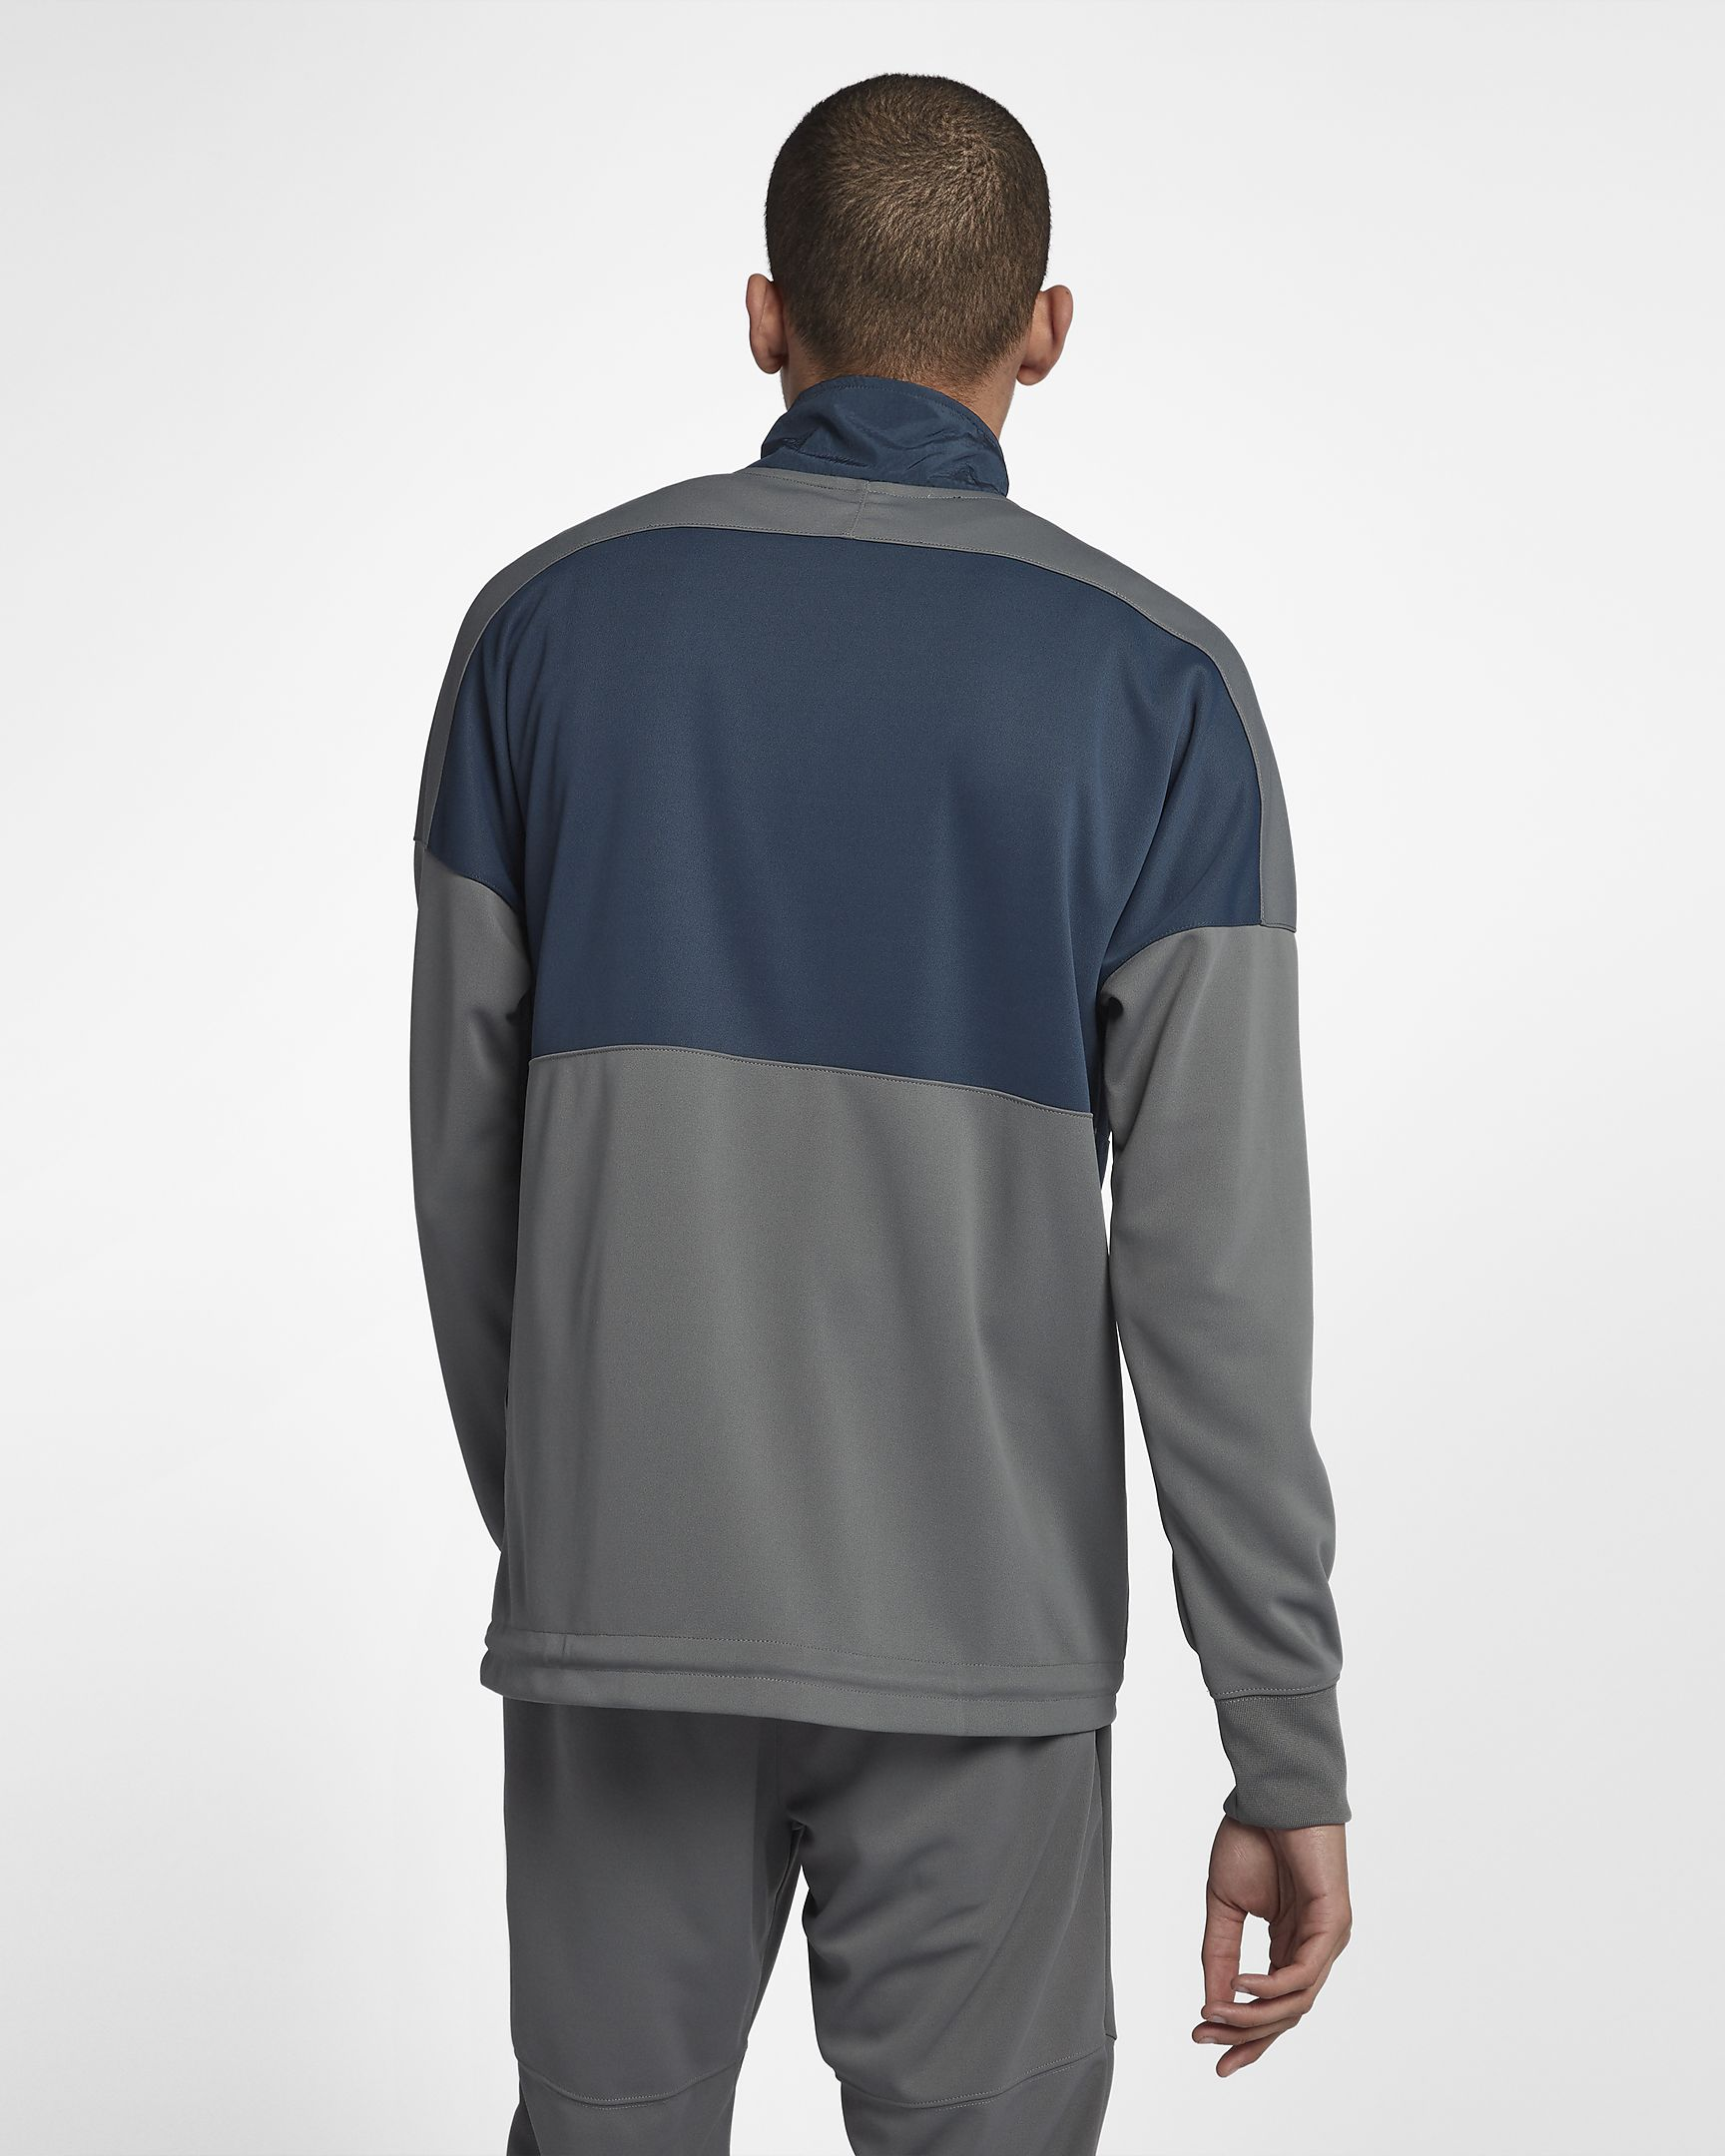 e5a80c91327c Men s Clothing Nike NSW Air Half Zip Top Men New Grey White Dark Blue  918324-471